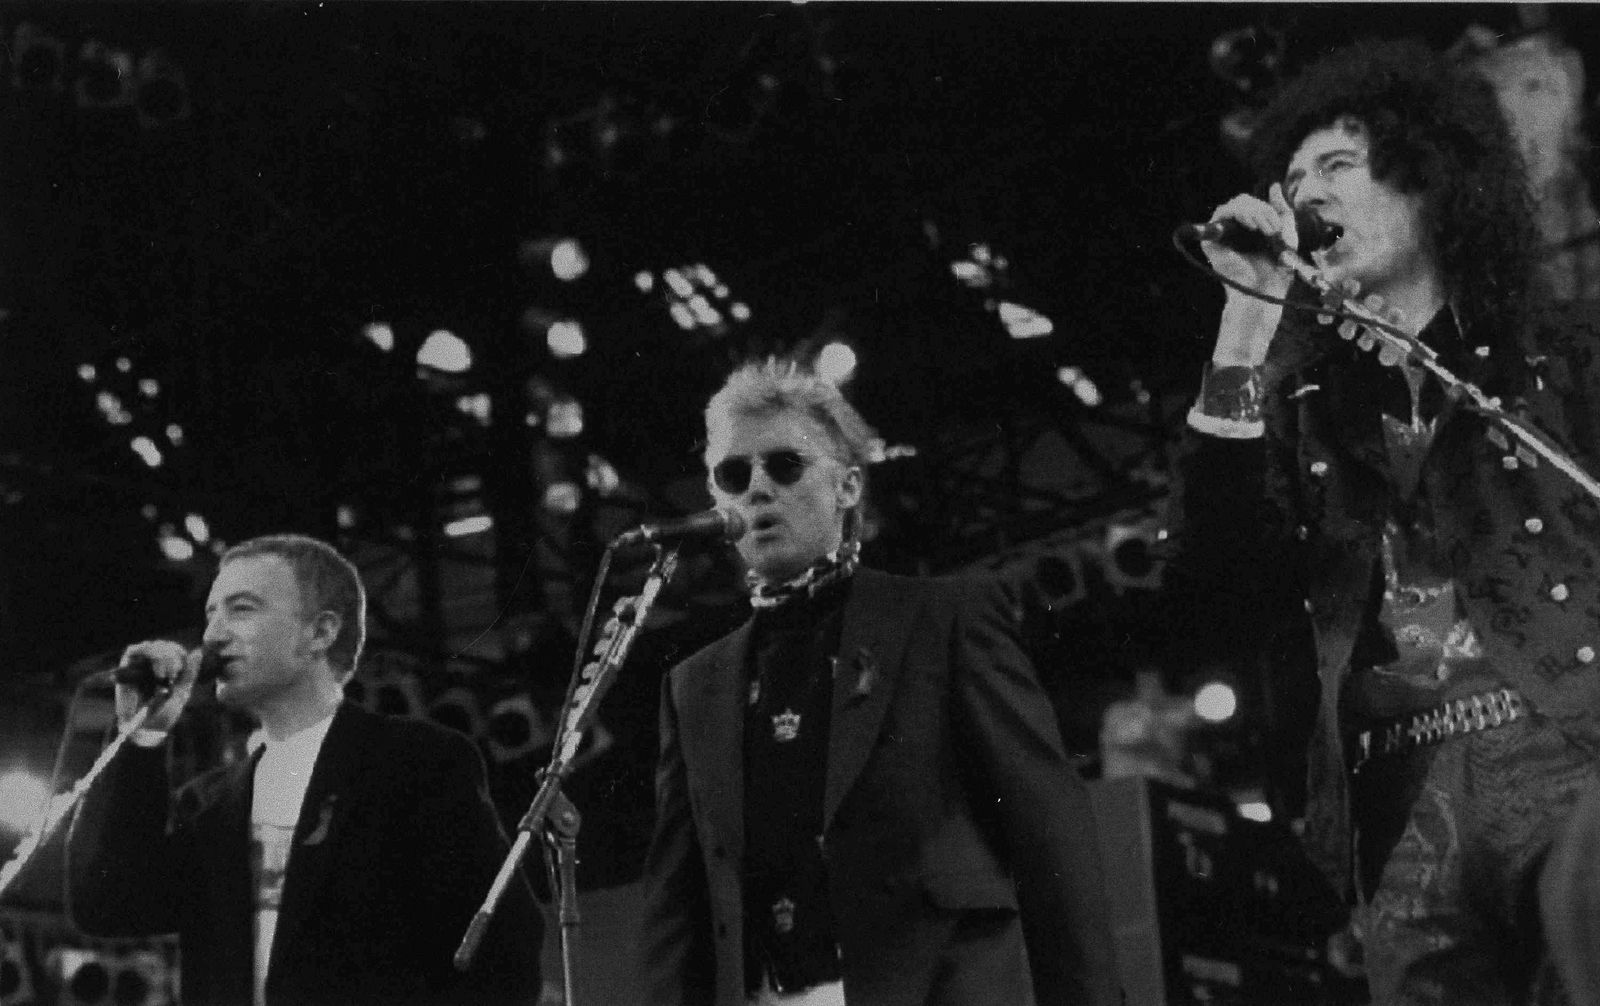 John Deacon, Roger taylor, Brian May